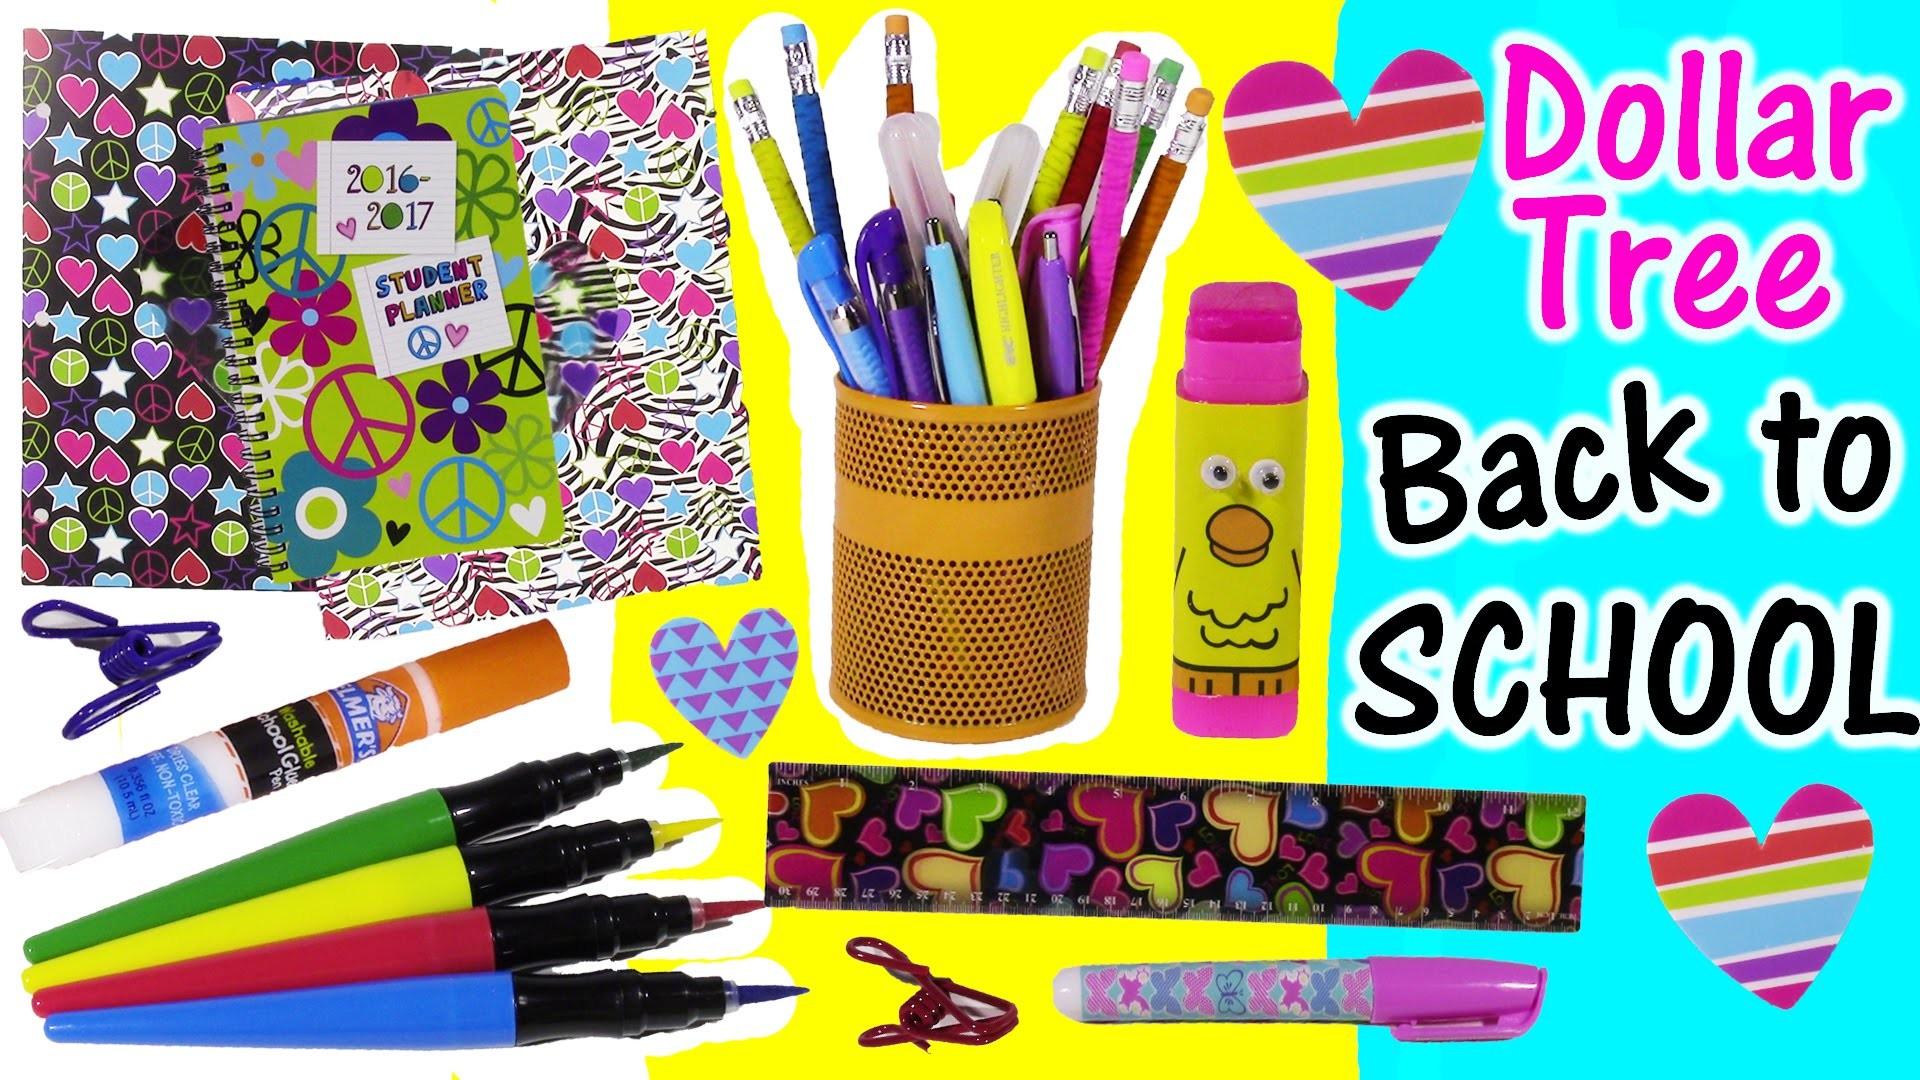 DOLLAR TREE Back to SCHOOL Bonanza Part 1! Folders Smelly Pens Paintbrush Markers Lip Balm! FUN HAUL